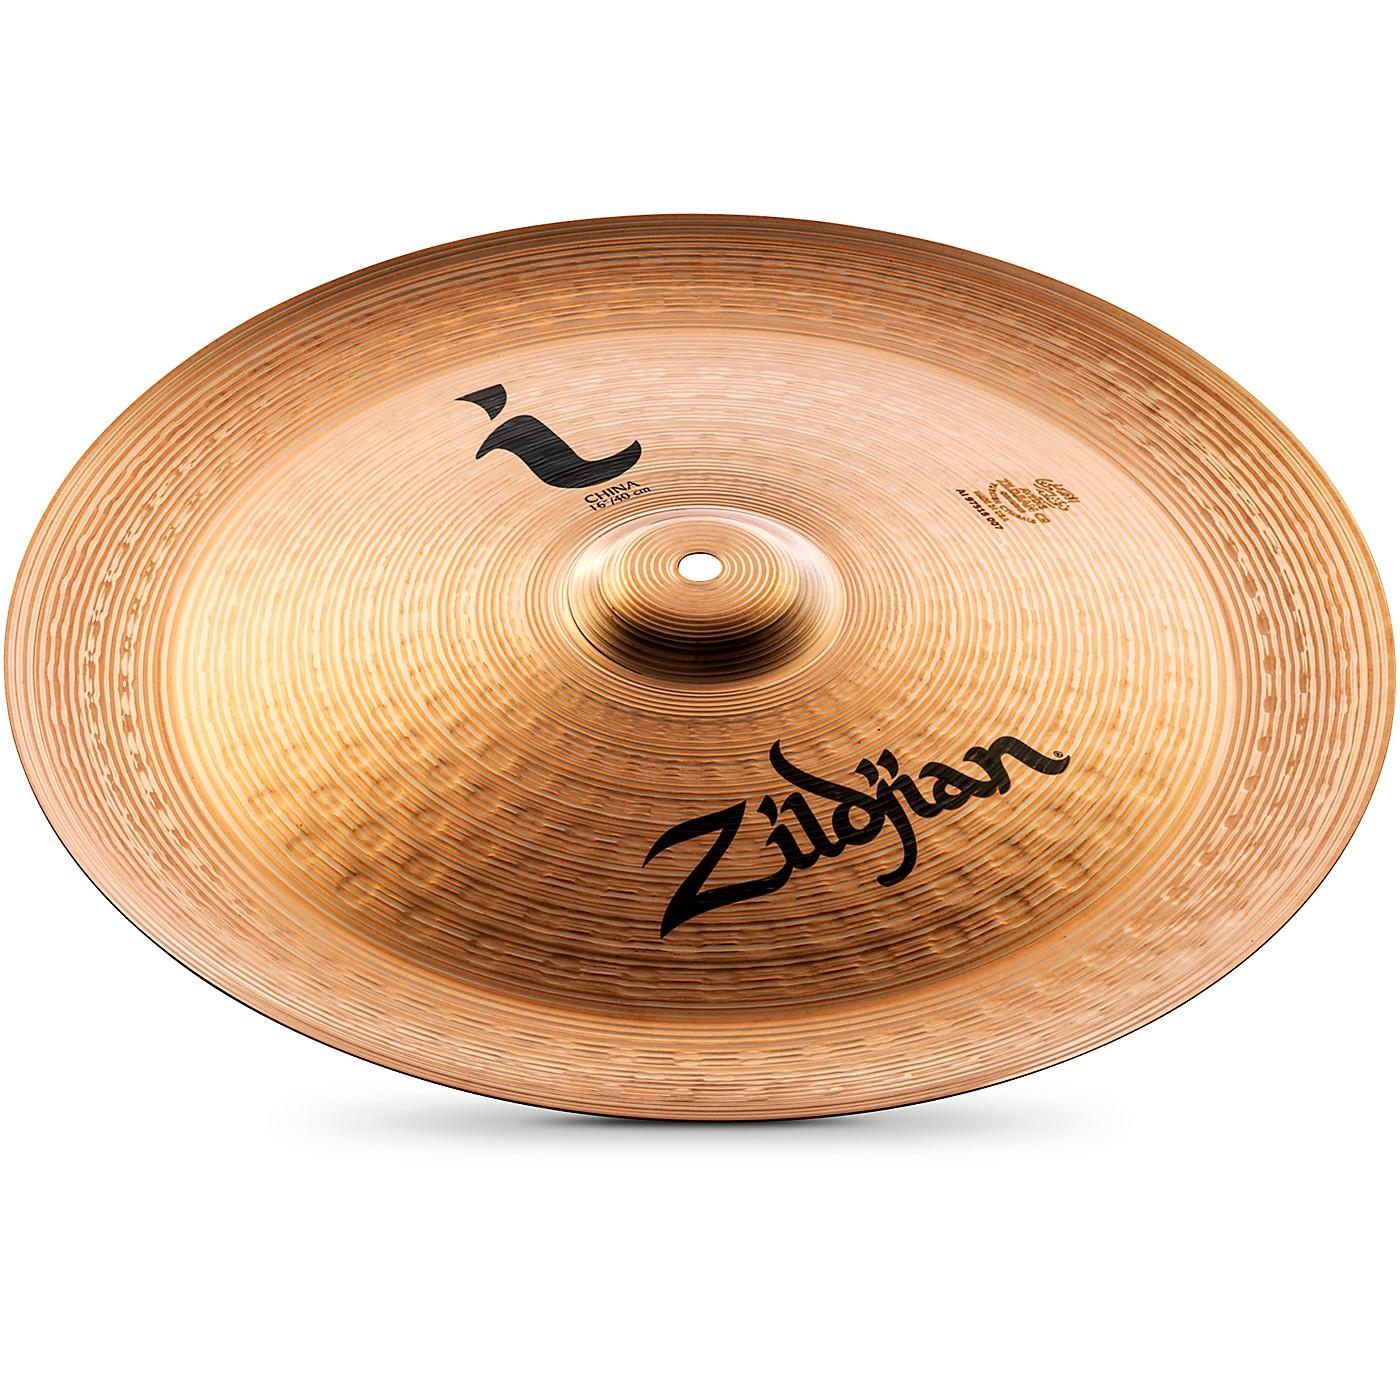 Zildjian I Series China Cymbal thumbnail